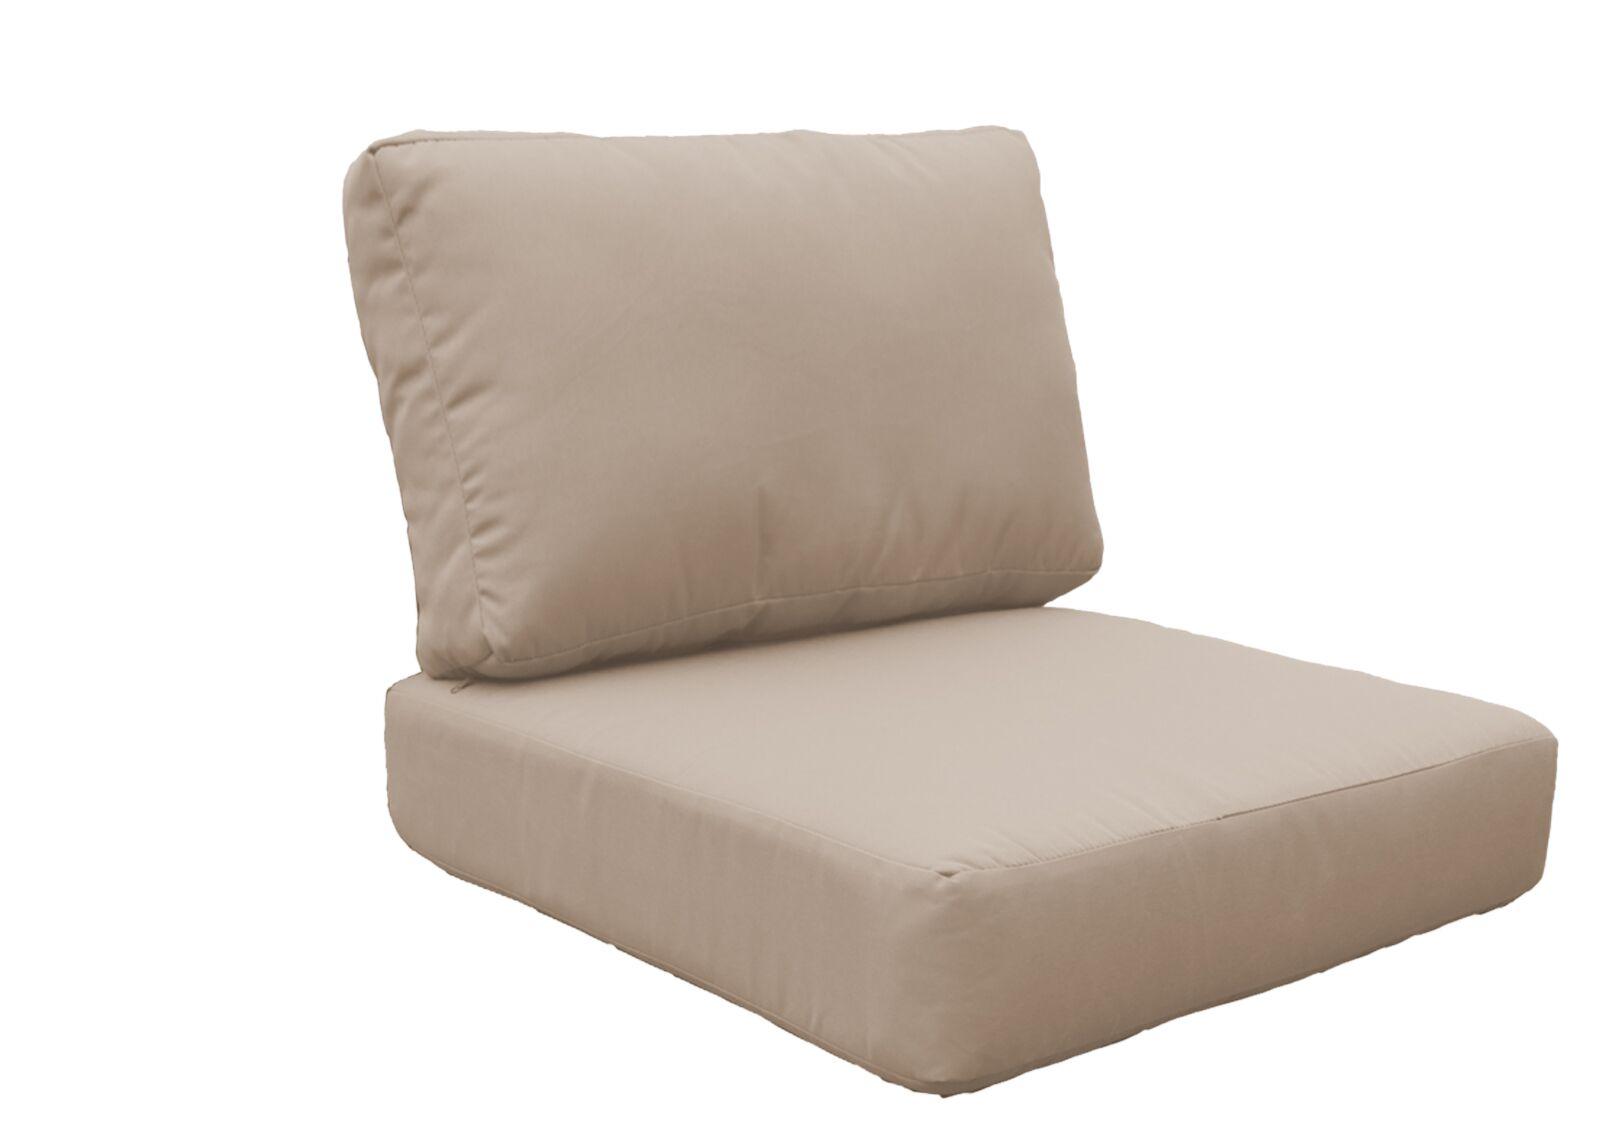 Miami 10 Piece Outdoor Lounge Chair Cushion Set Fabric: Wheat